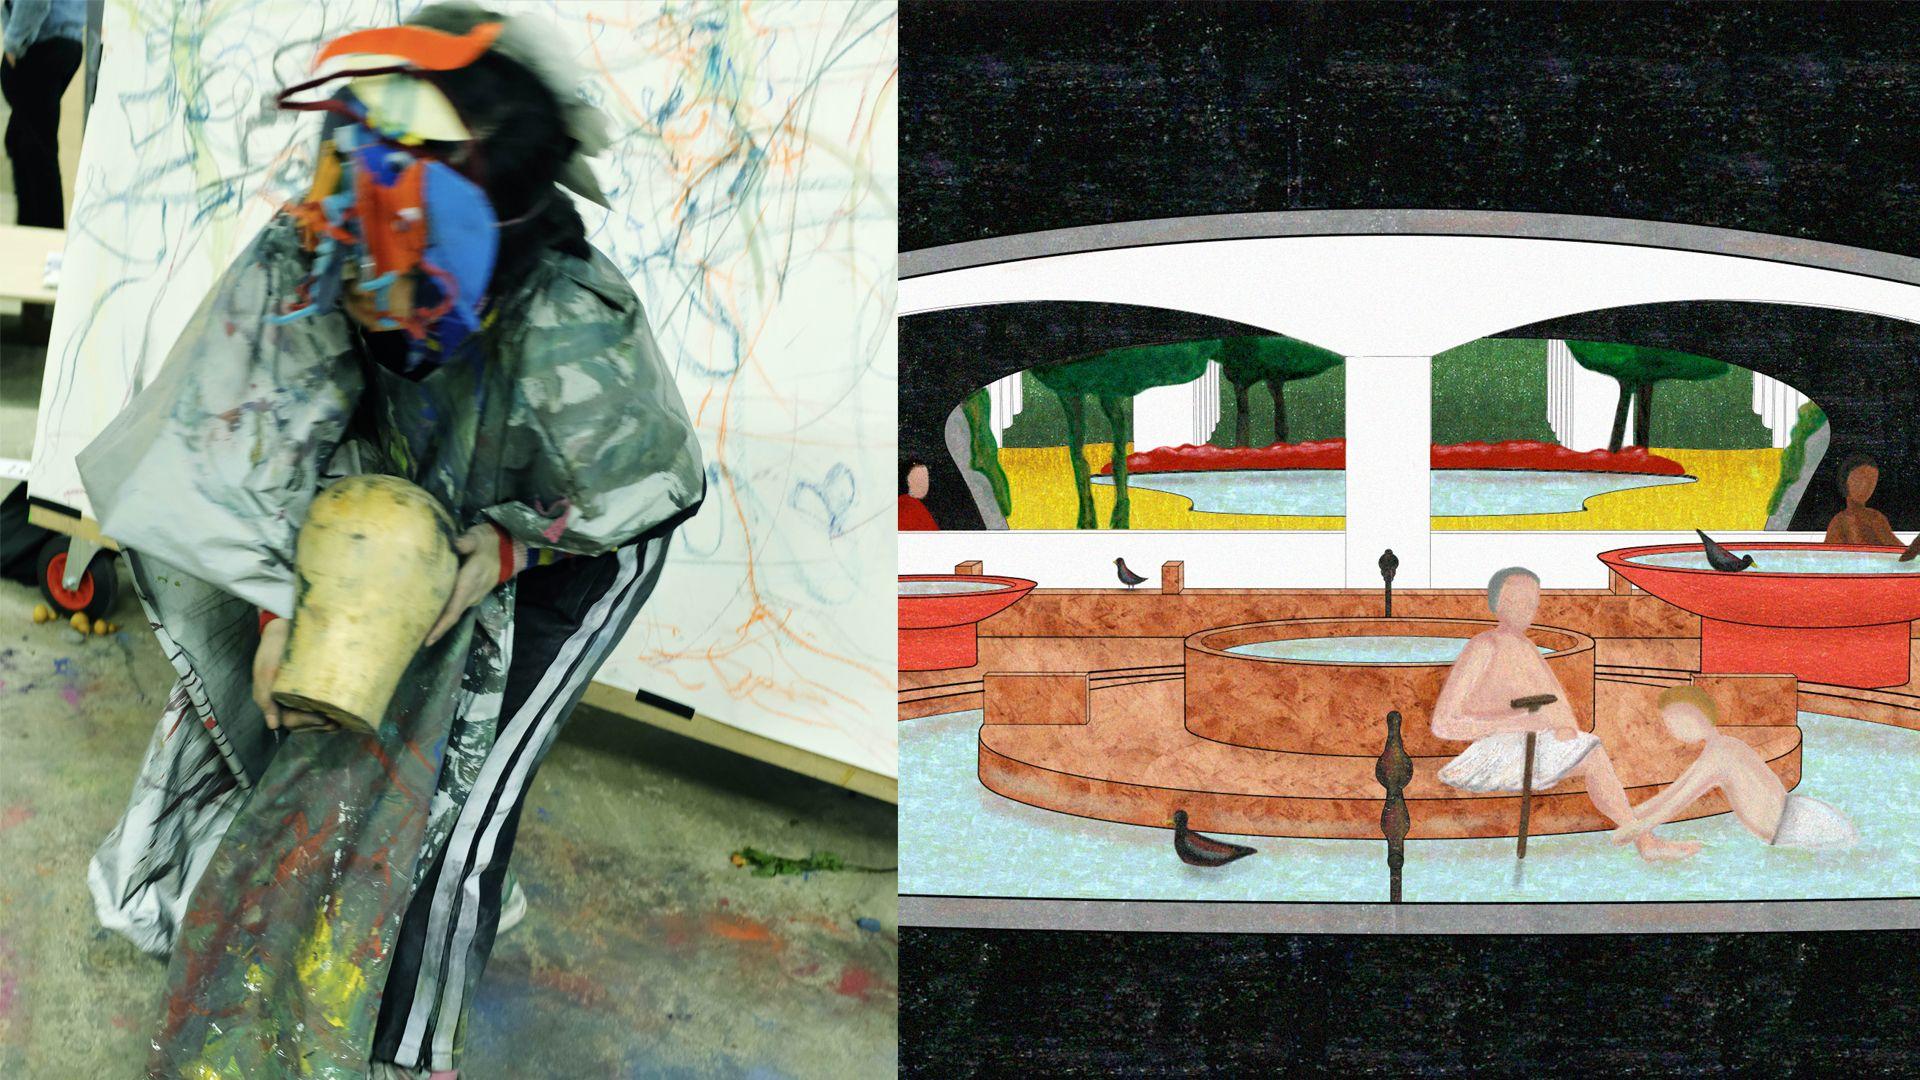 Works by Vicky Yijia Tang, MA Visual Communication (Illustration) and Adalberto Lonardi, MA Interior Architecture